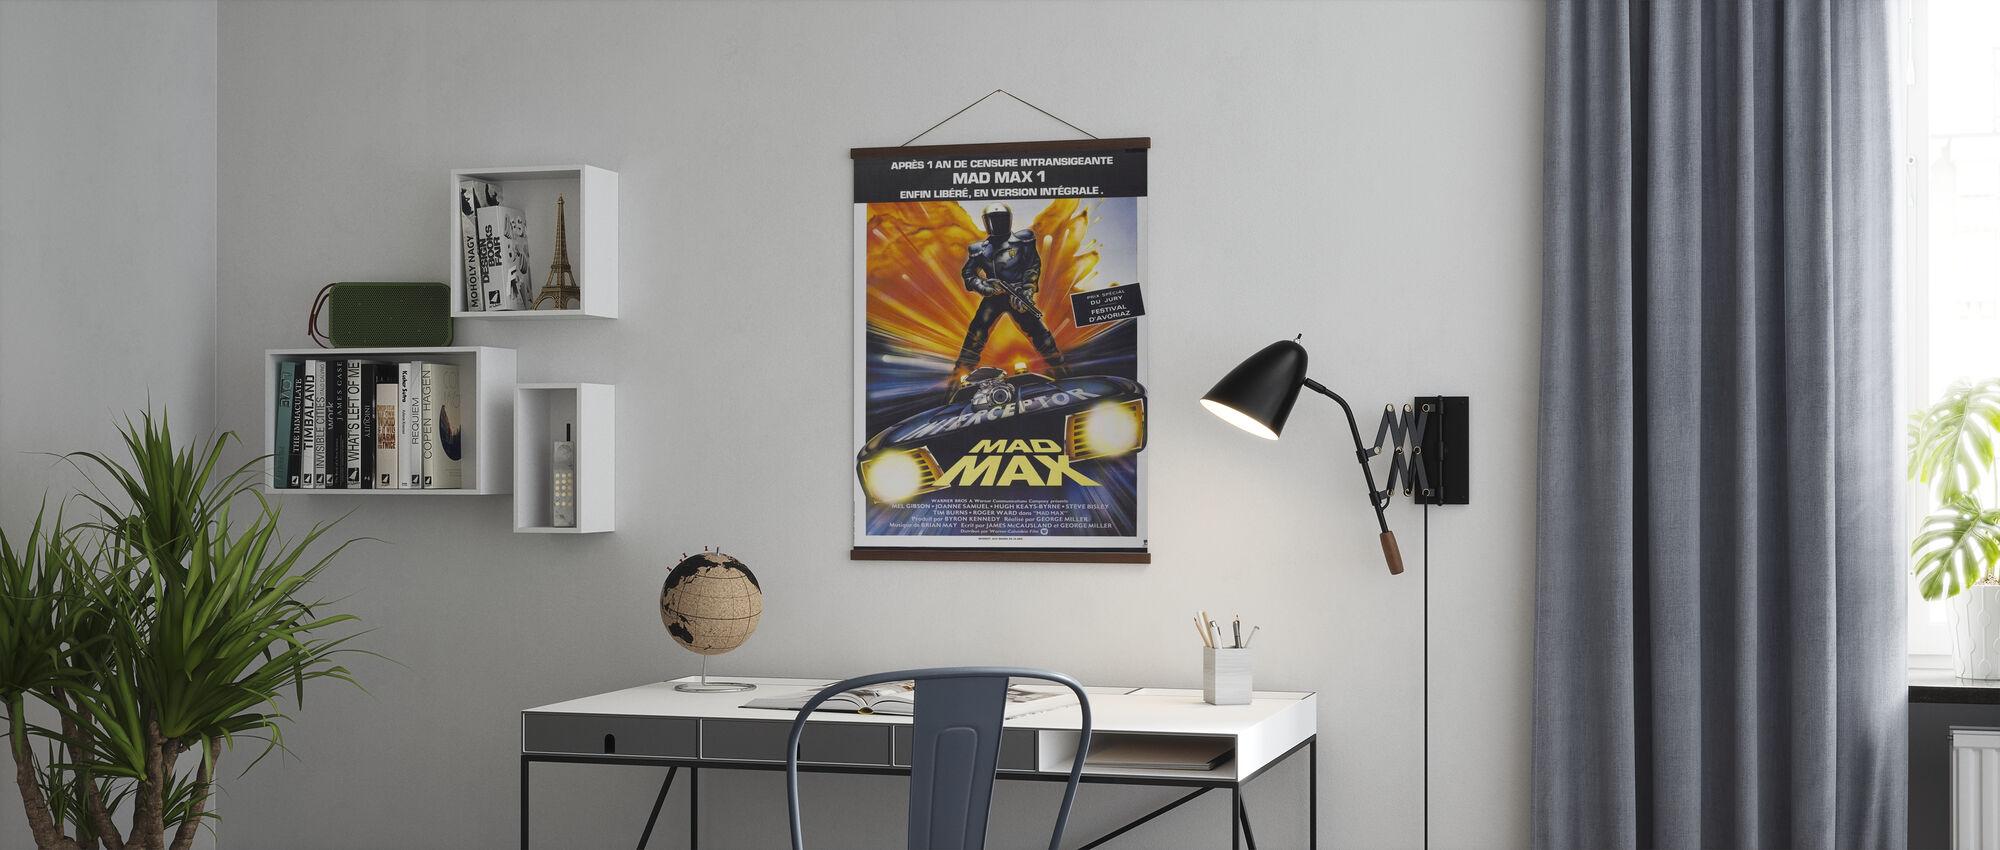 Franse film Poster Mad Max - Poster - Kantoor